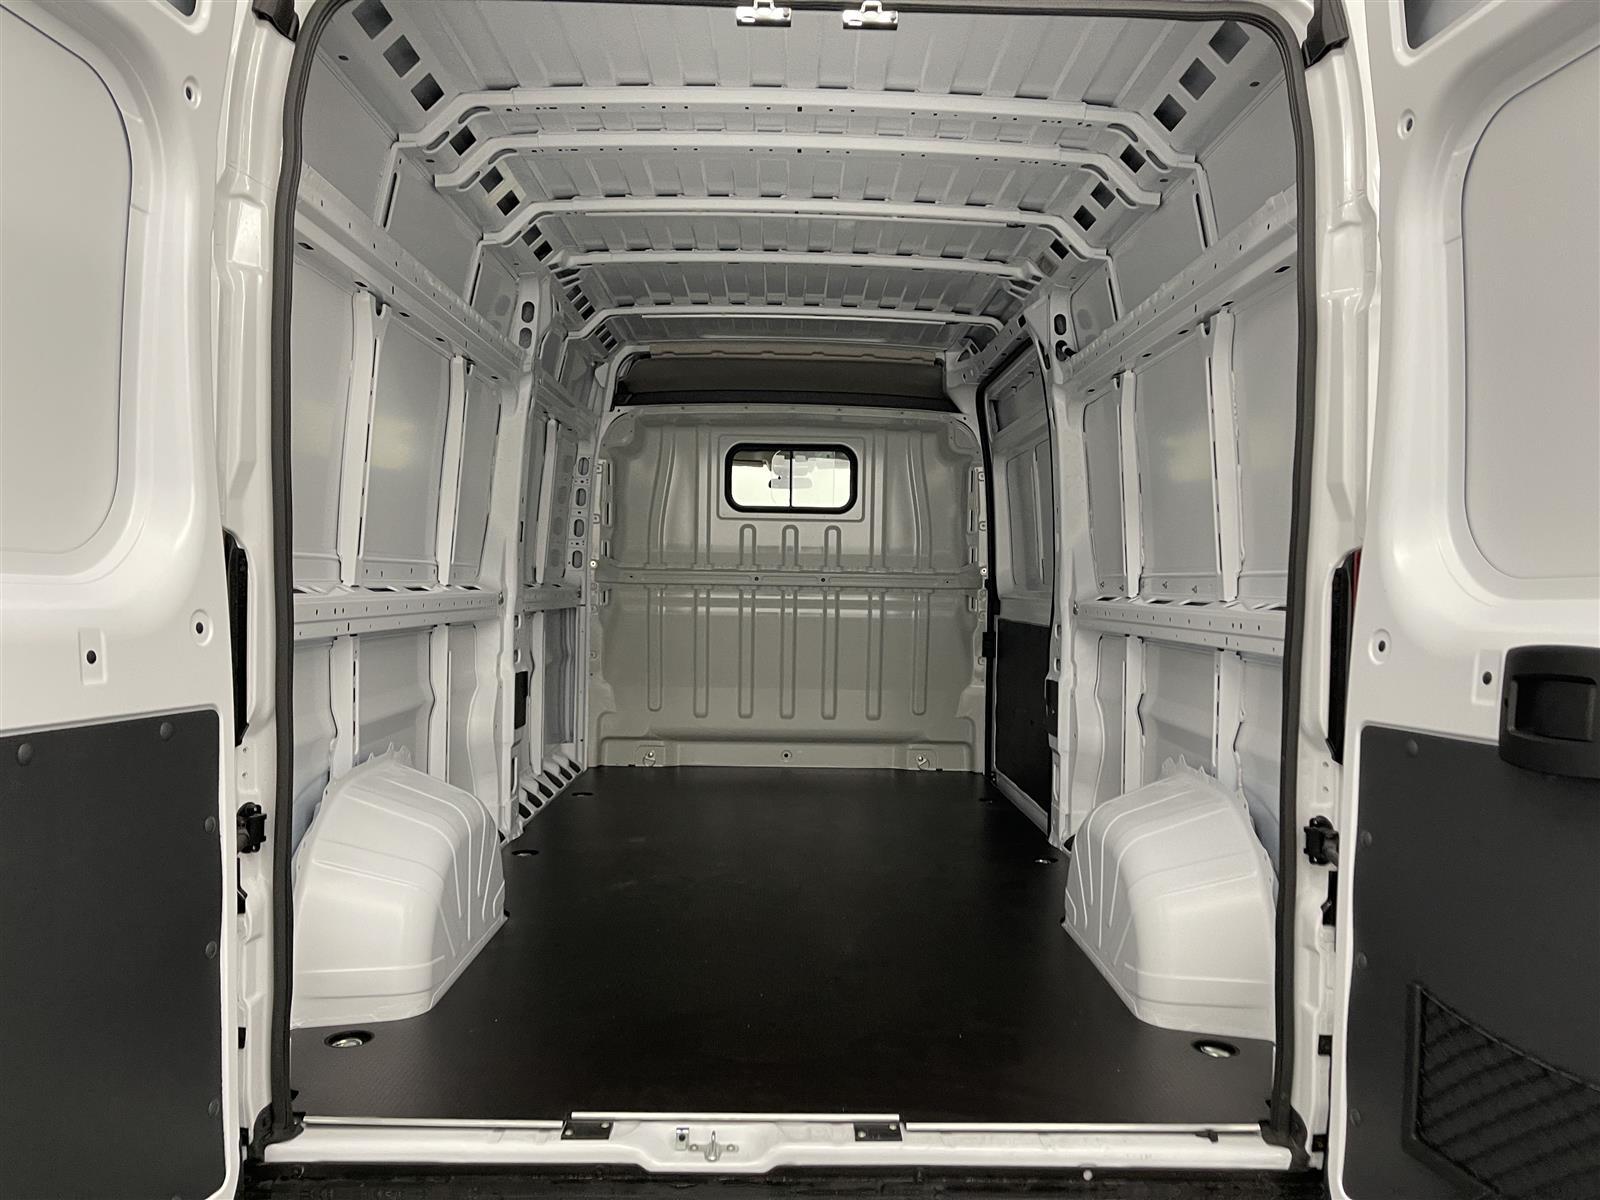 2021 Ram ProMaster 3500 FWD, Empty Cargo Van #ME519547 - photo 1